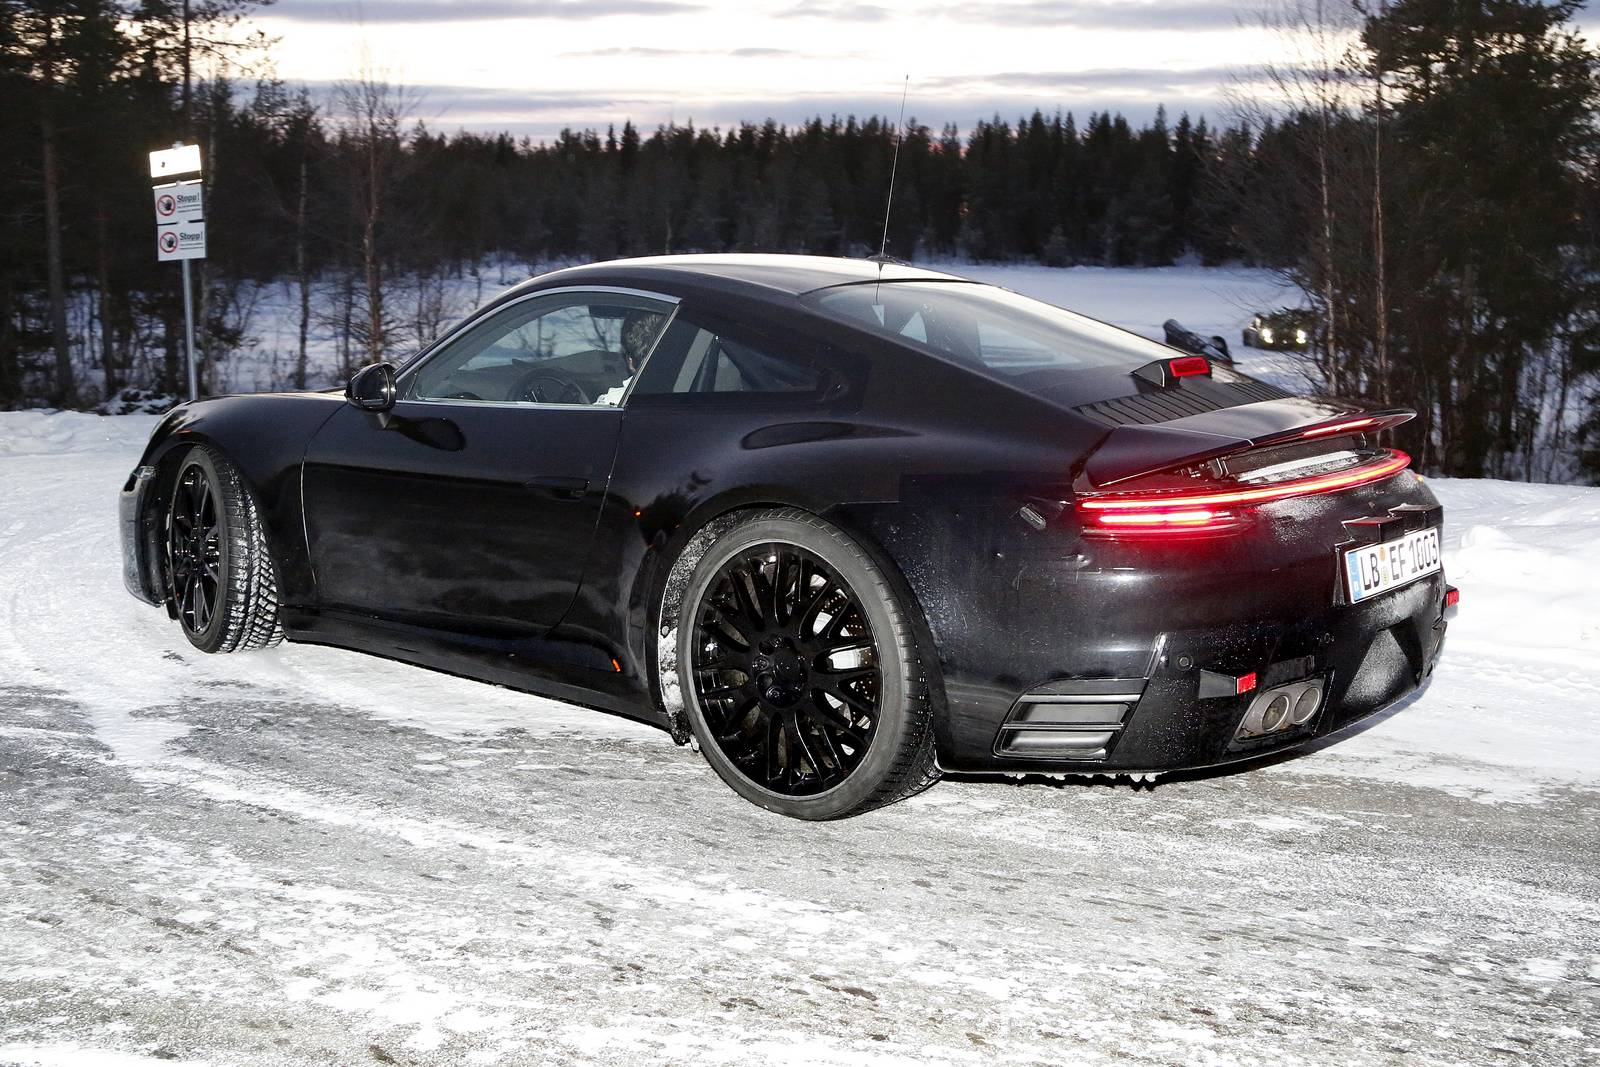 Spy Shots 8th Gen 2019 Porsche 911 Type 992 All Turbo